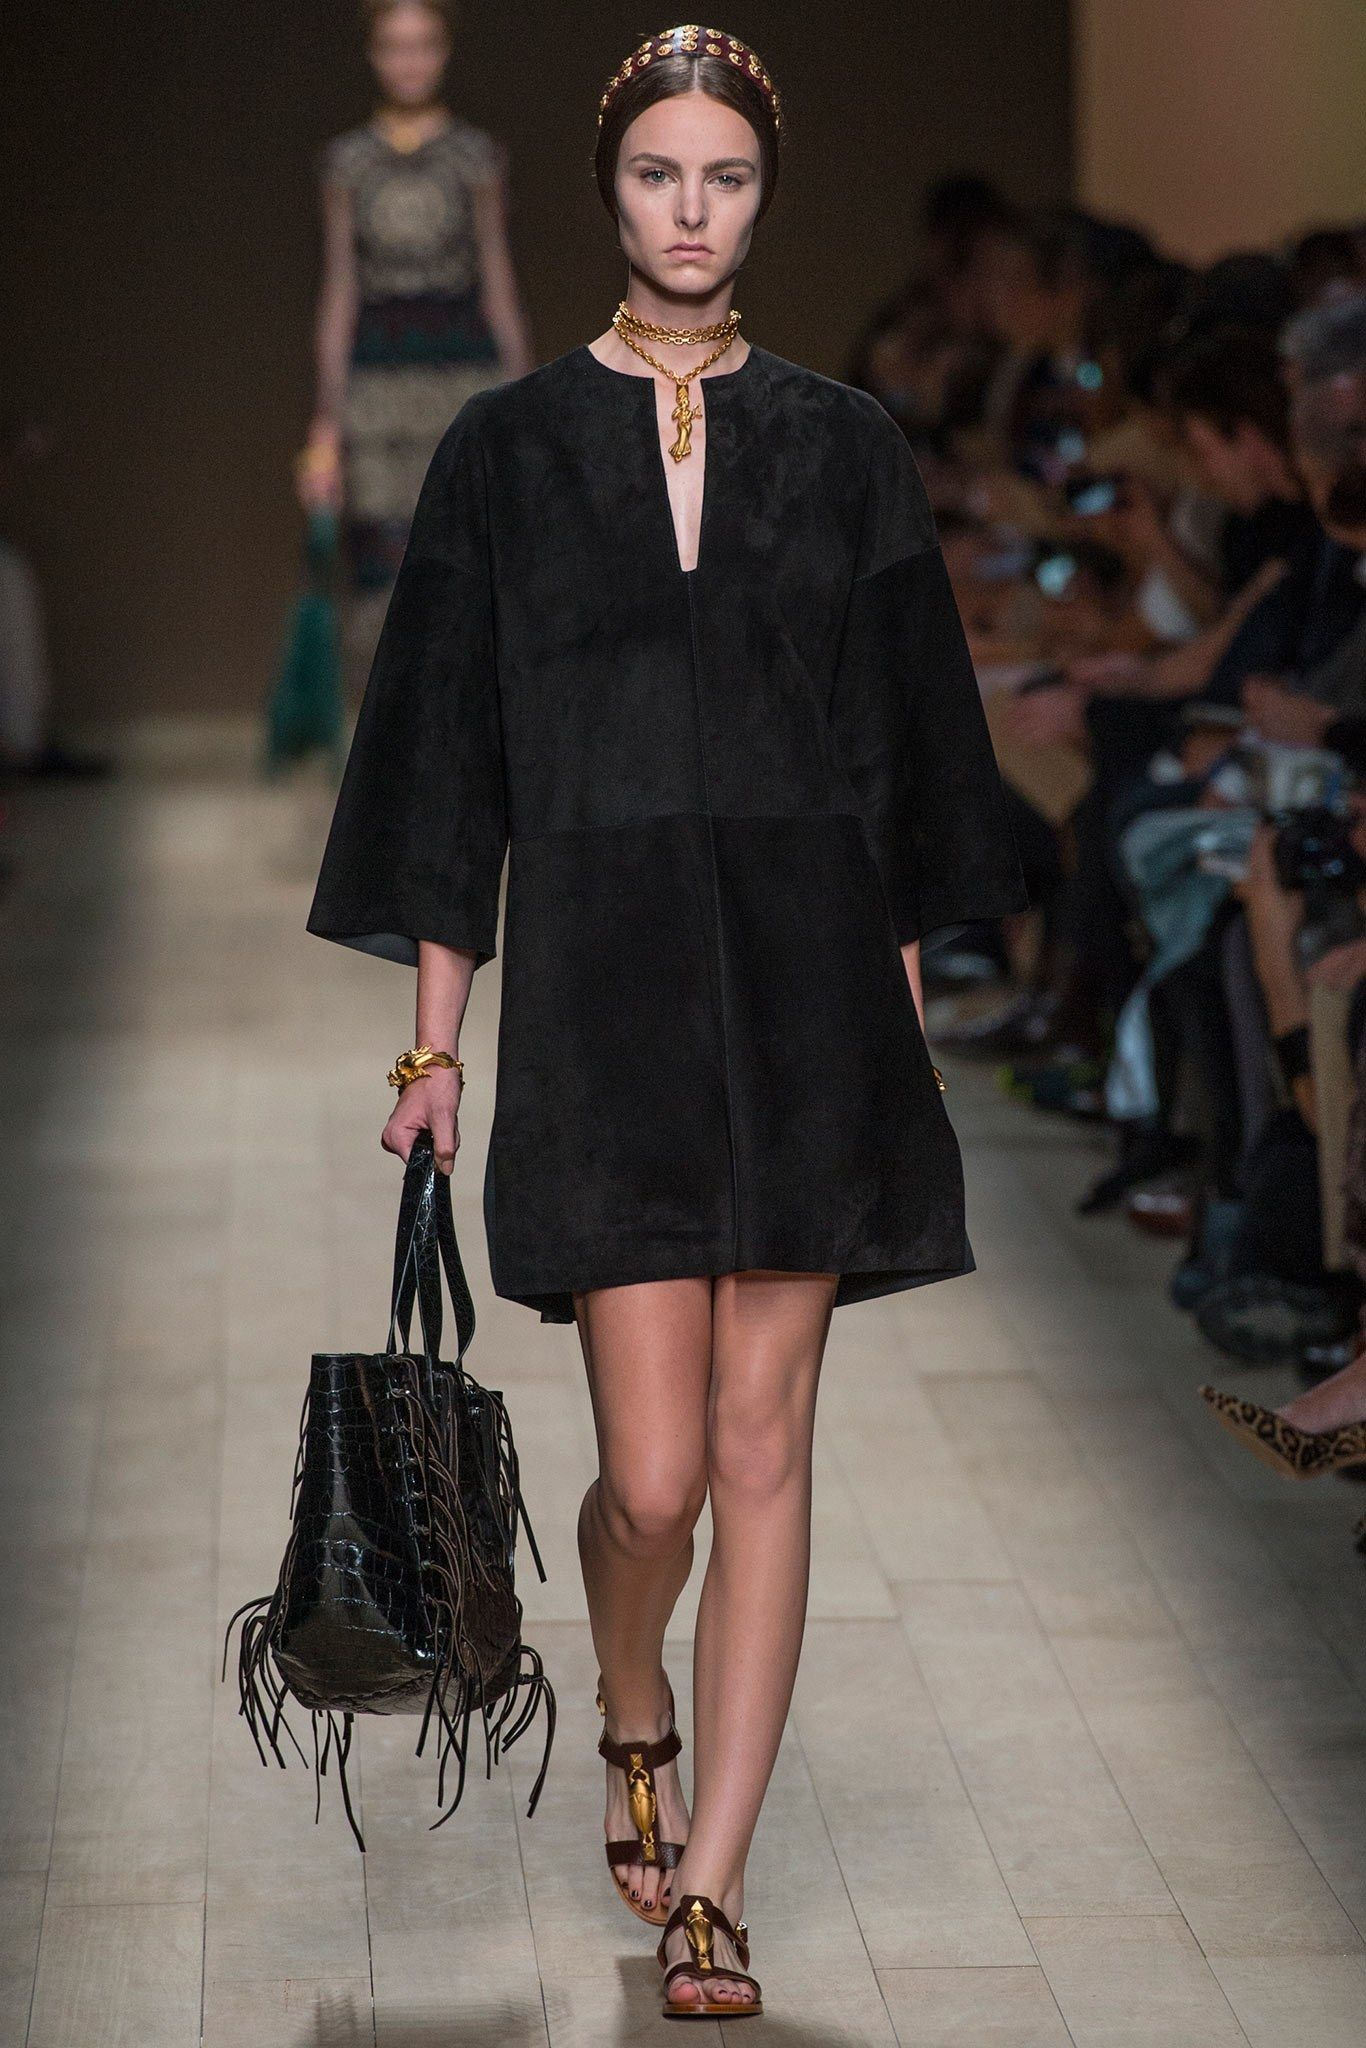 Valentino Spring 2014 Ready-to-Wear Fashion Show - Estella Brons